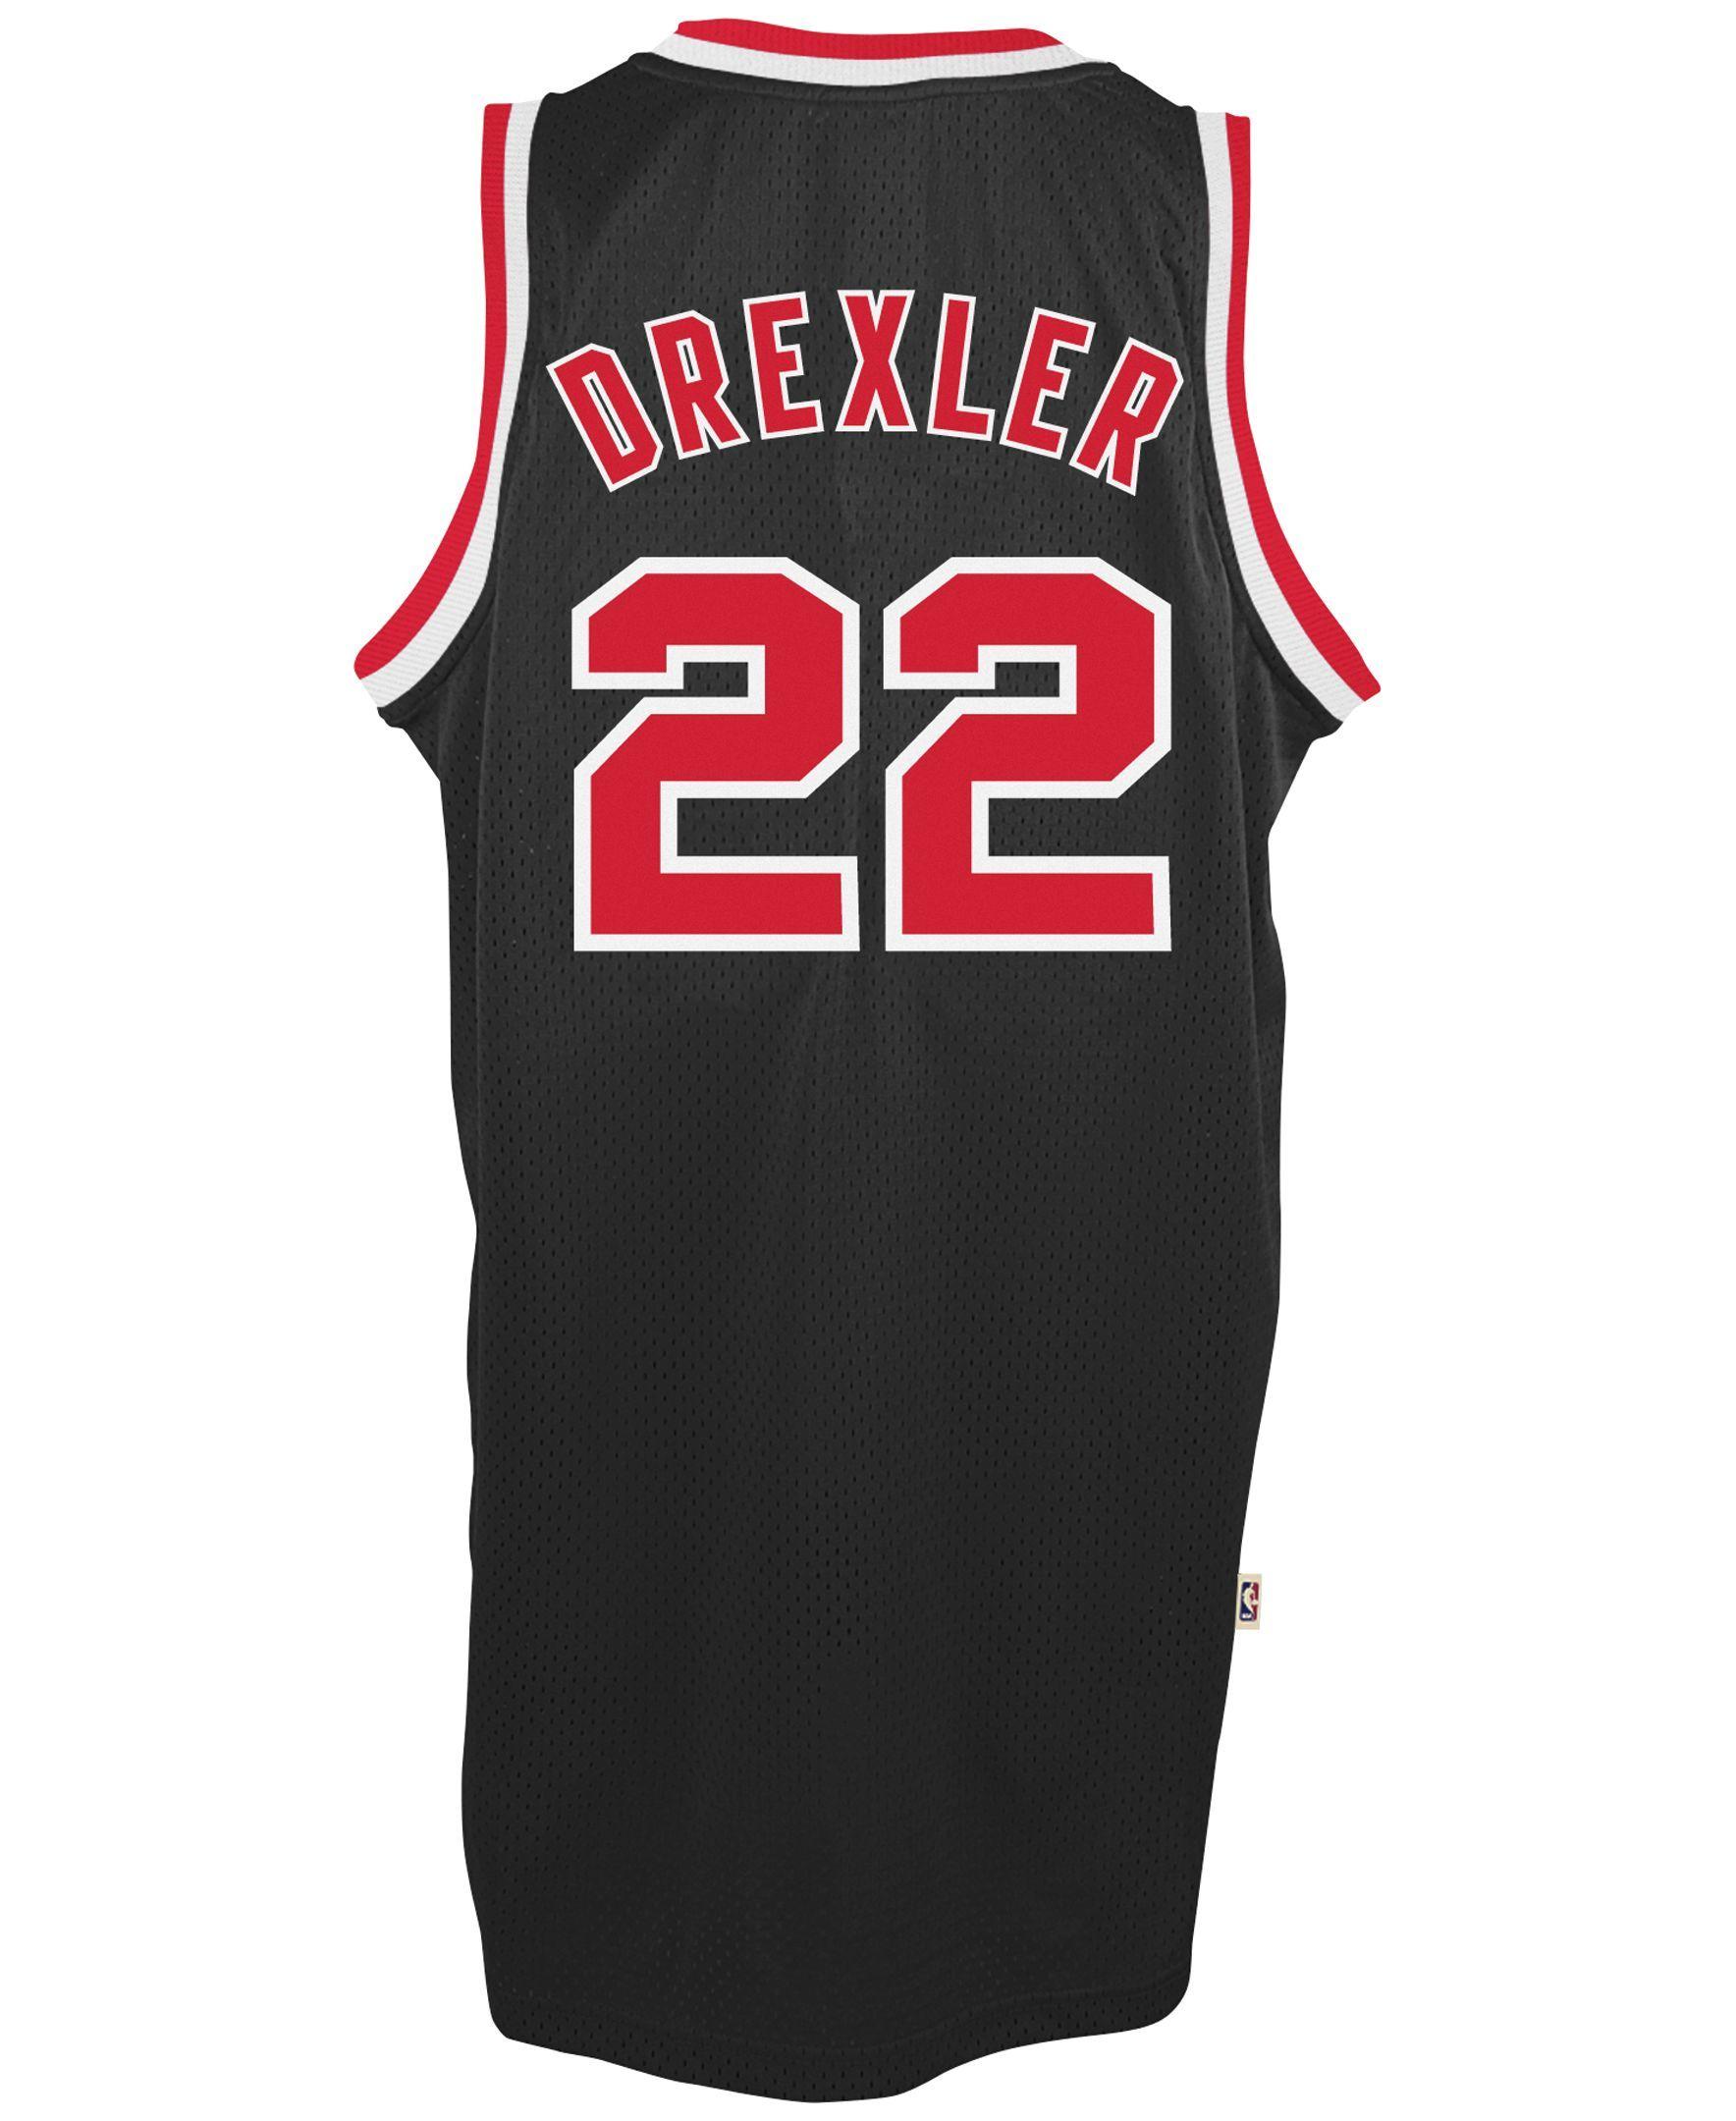 409c5f5a746 adidas Men s Clyde Drexler Portland Trail Blazers Swingman Jersey ...